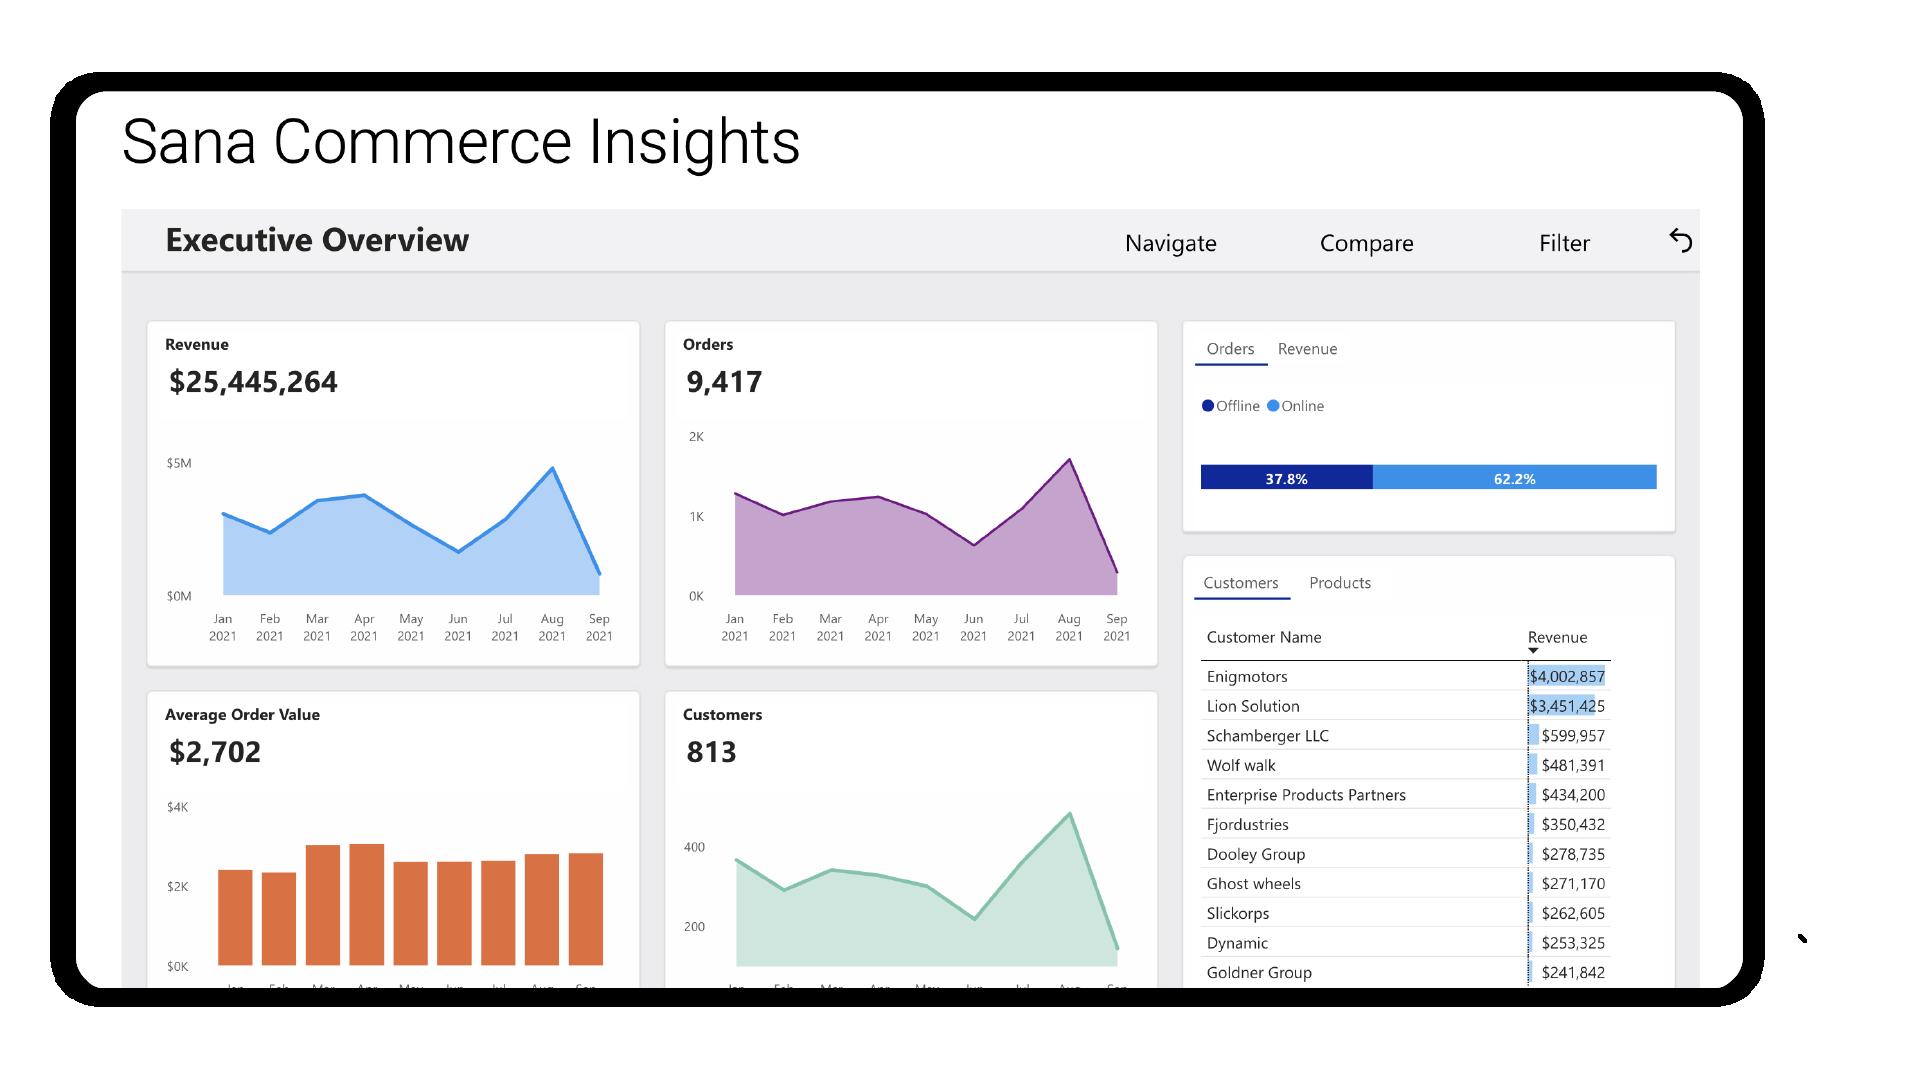 Sana Commerce Insights Dashboard